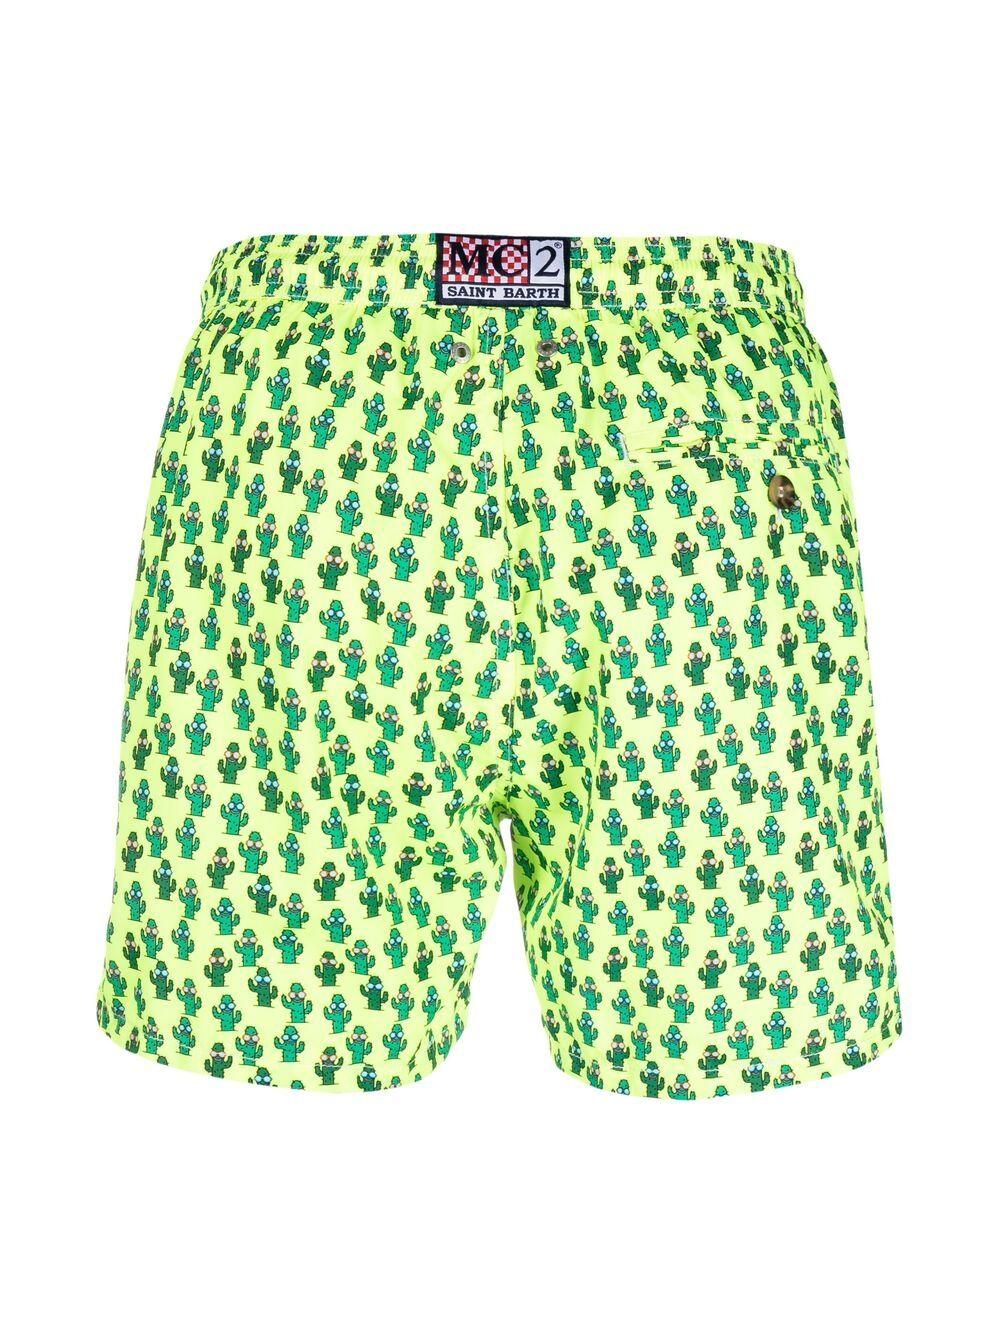 Neon-yellow recycled polyester Cactus graphic-print swim shorts  MC2 |  | LIGHTING MICRO FANTASY-CACTUS SUN94